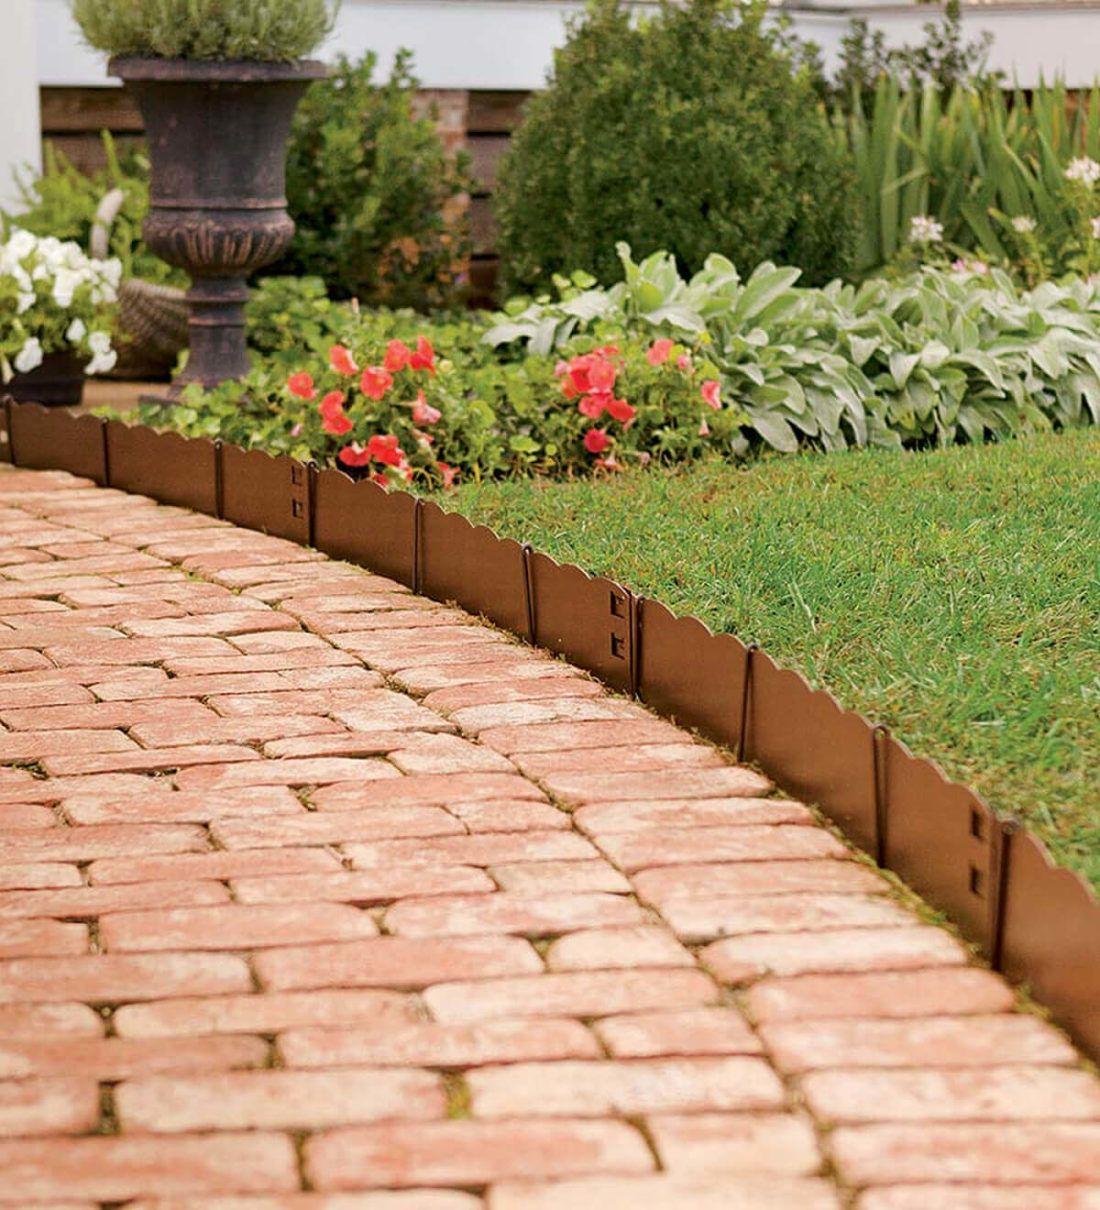 68 Creative Cheap Garden Edging Ideas That Will Transform Your Yard Landscape Edging Garden Edging Lawn Edging